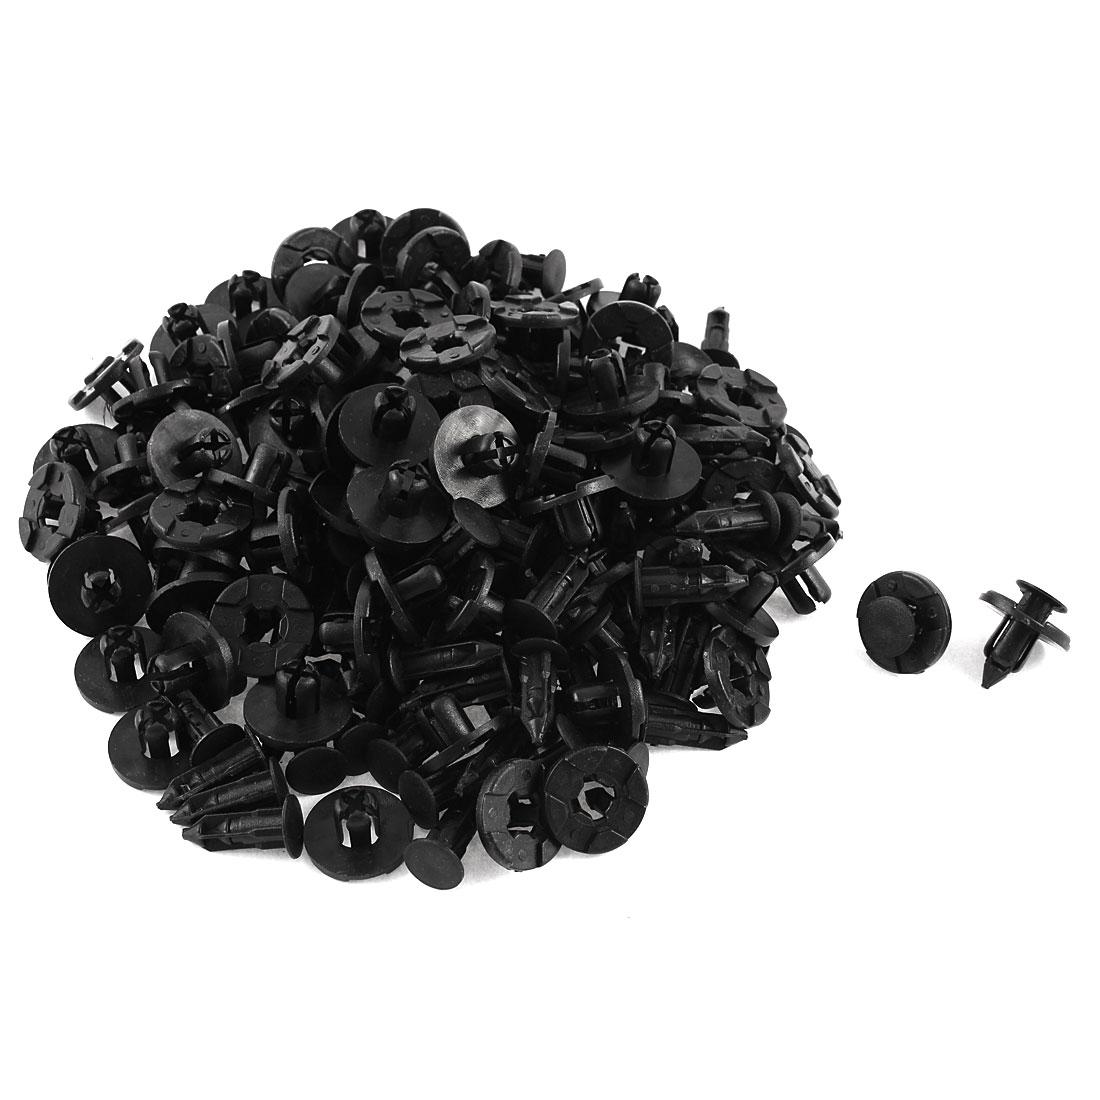 100 Pcs Black Plastic Rivet Trim Fastener Retainer Clips 8mm x 13mm x 20mm